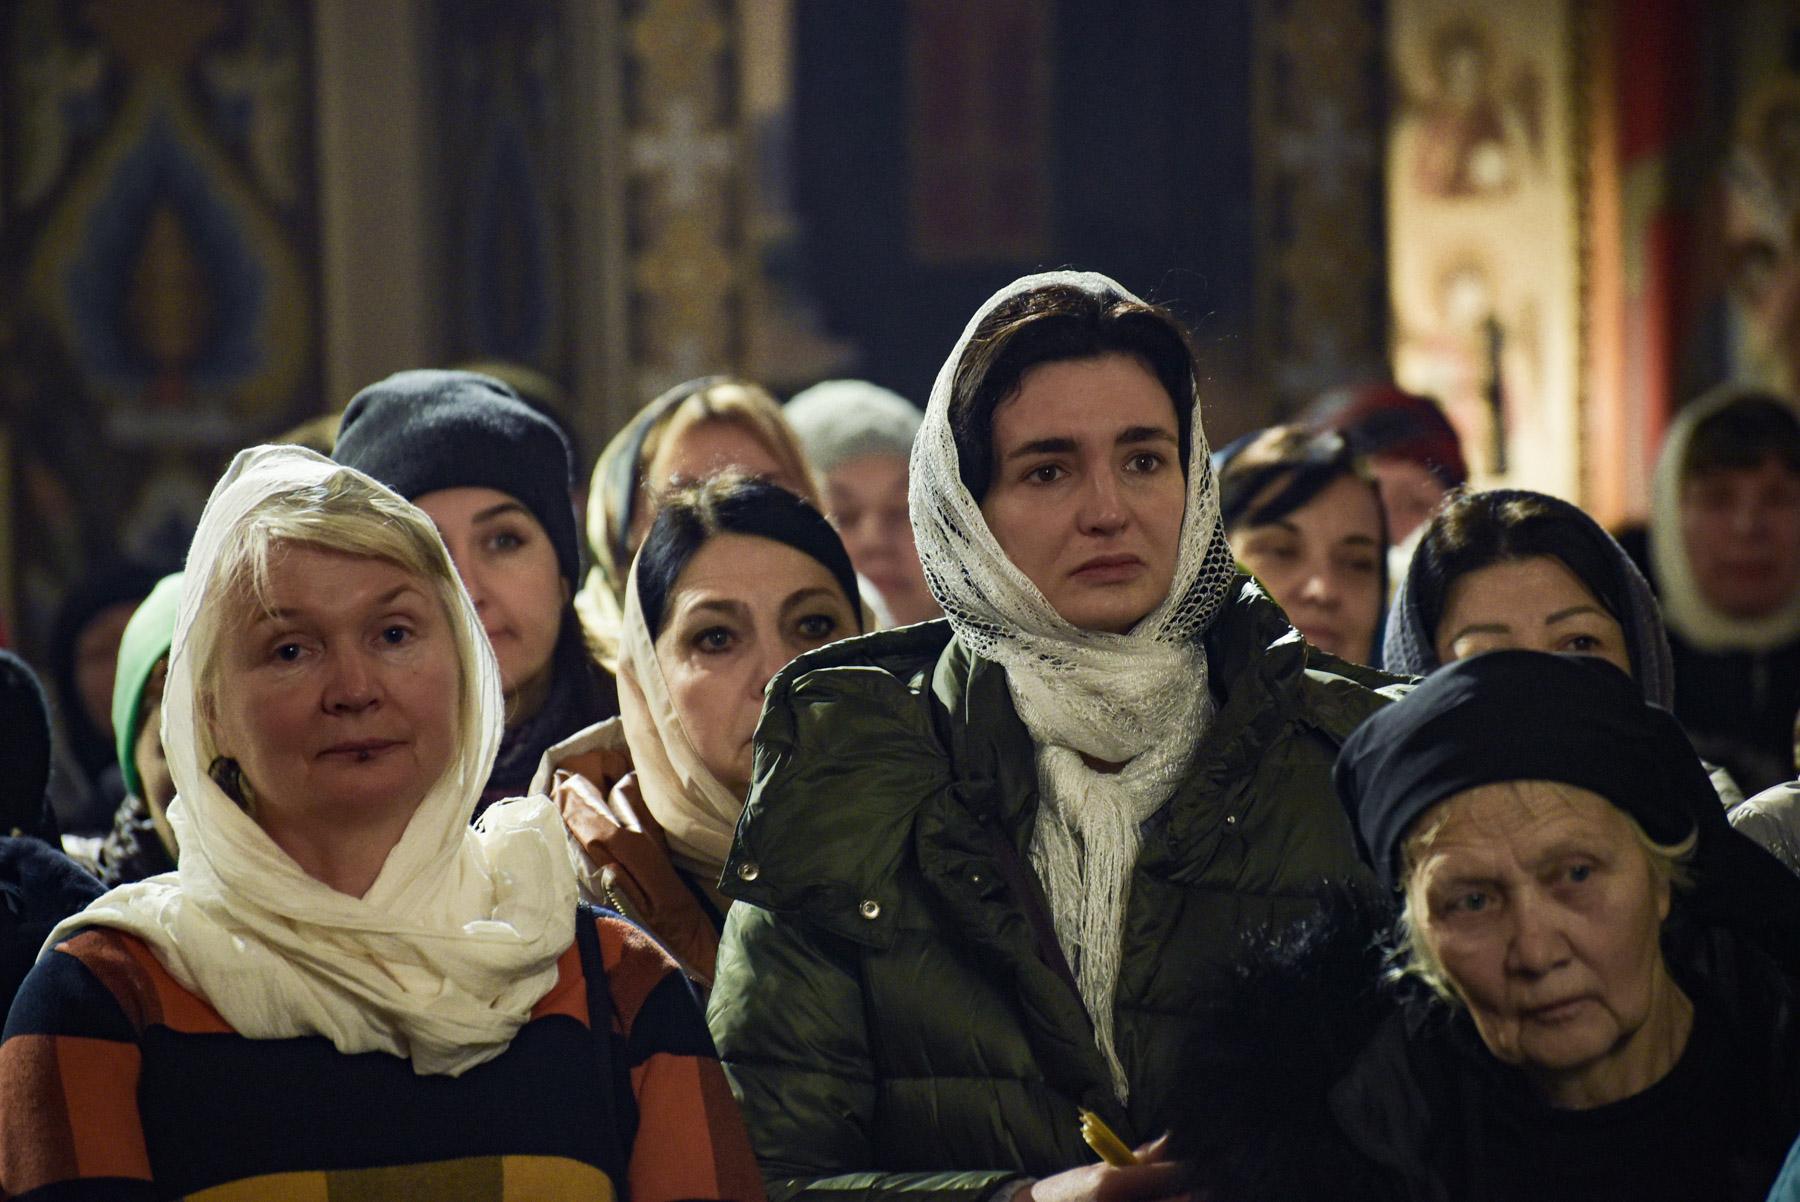 photos of orthodox christmas 0095 2